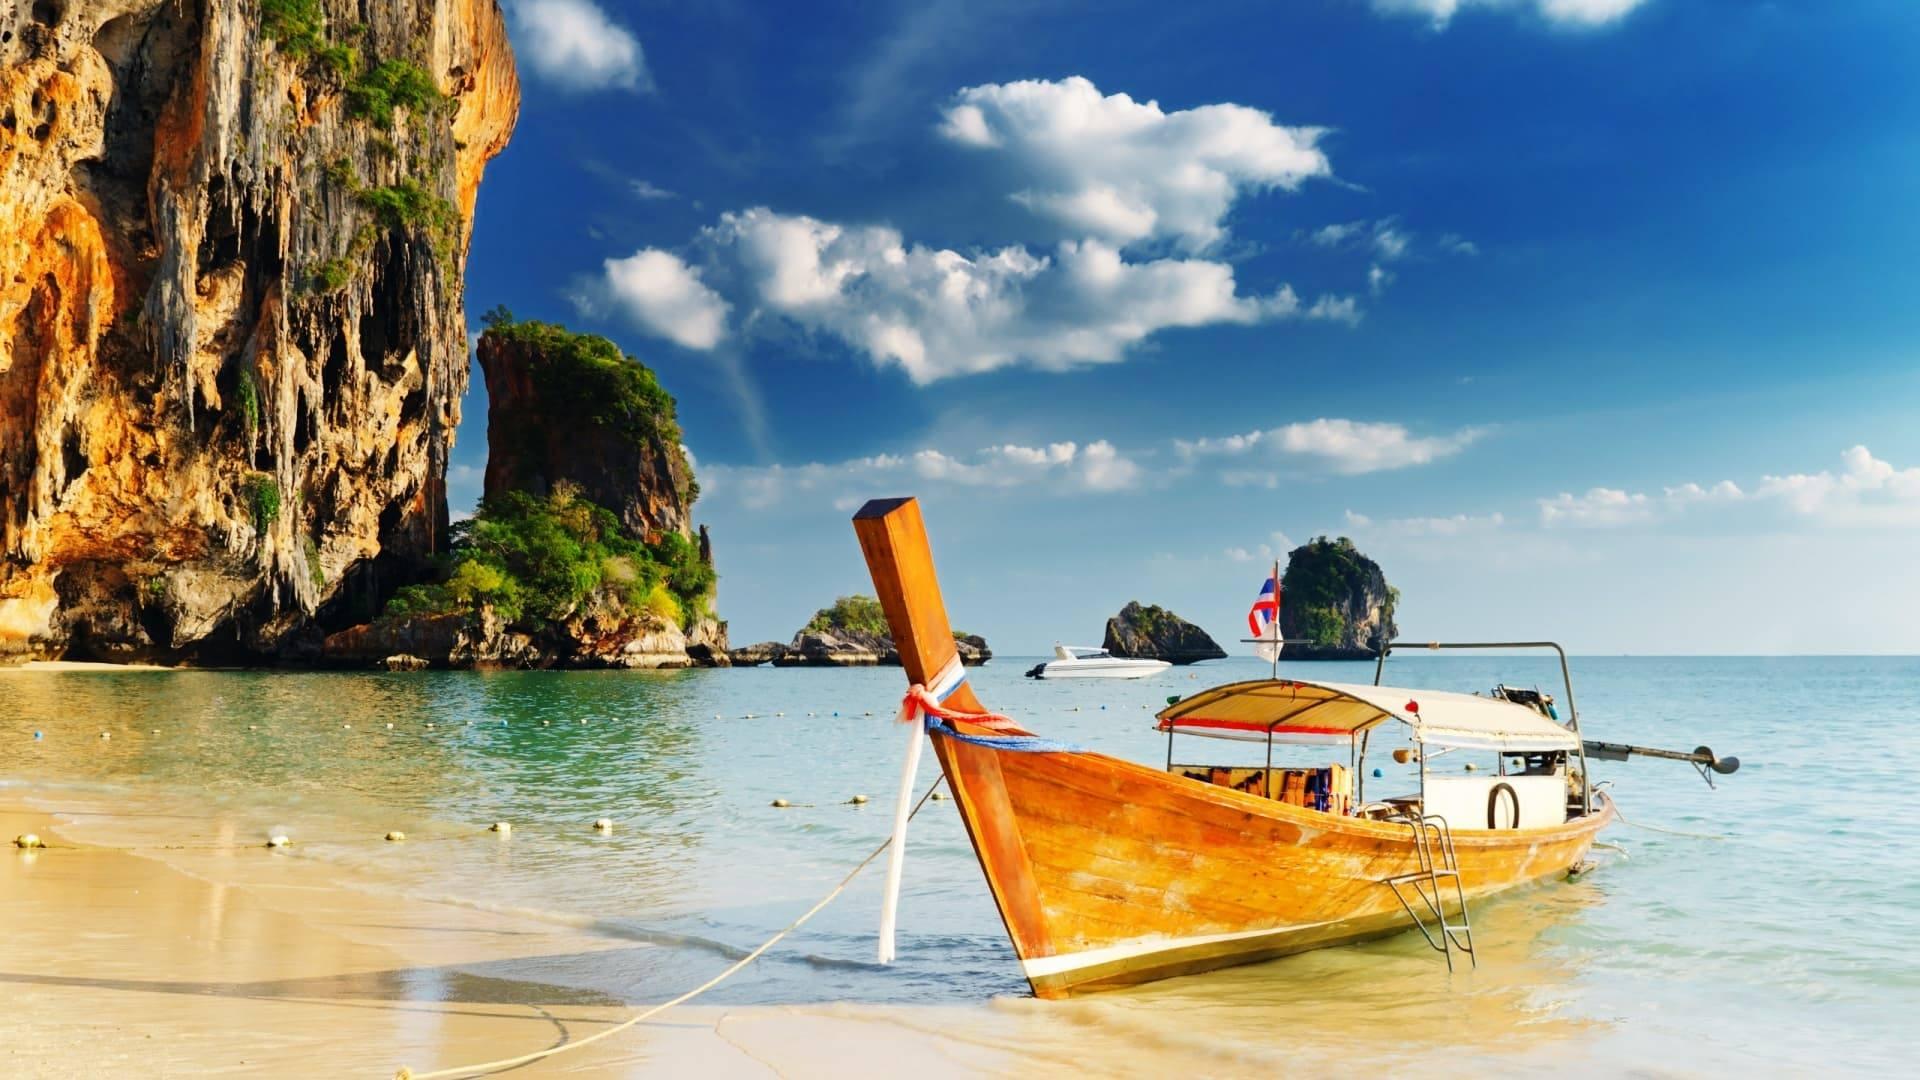 Картинки про отдых в море